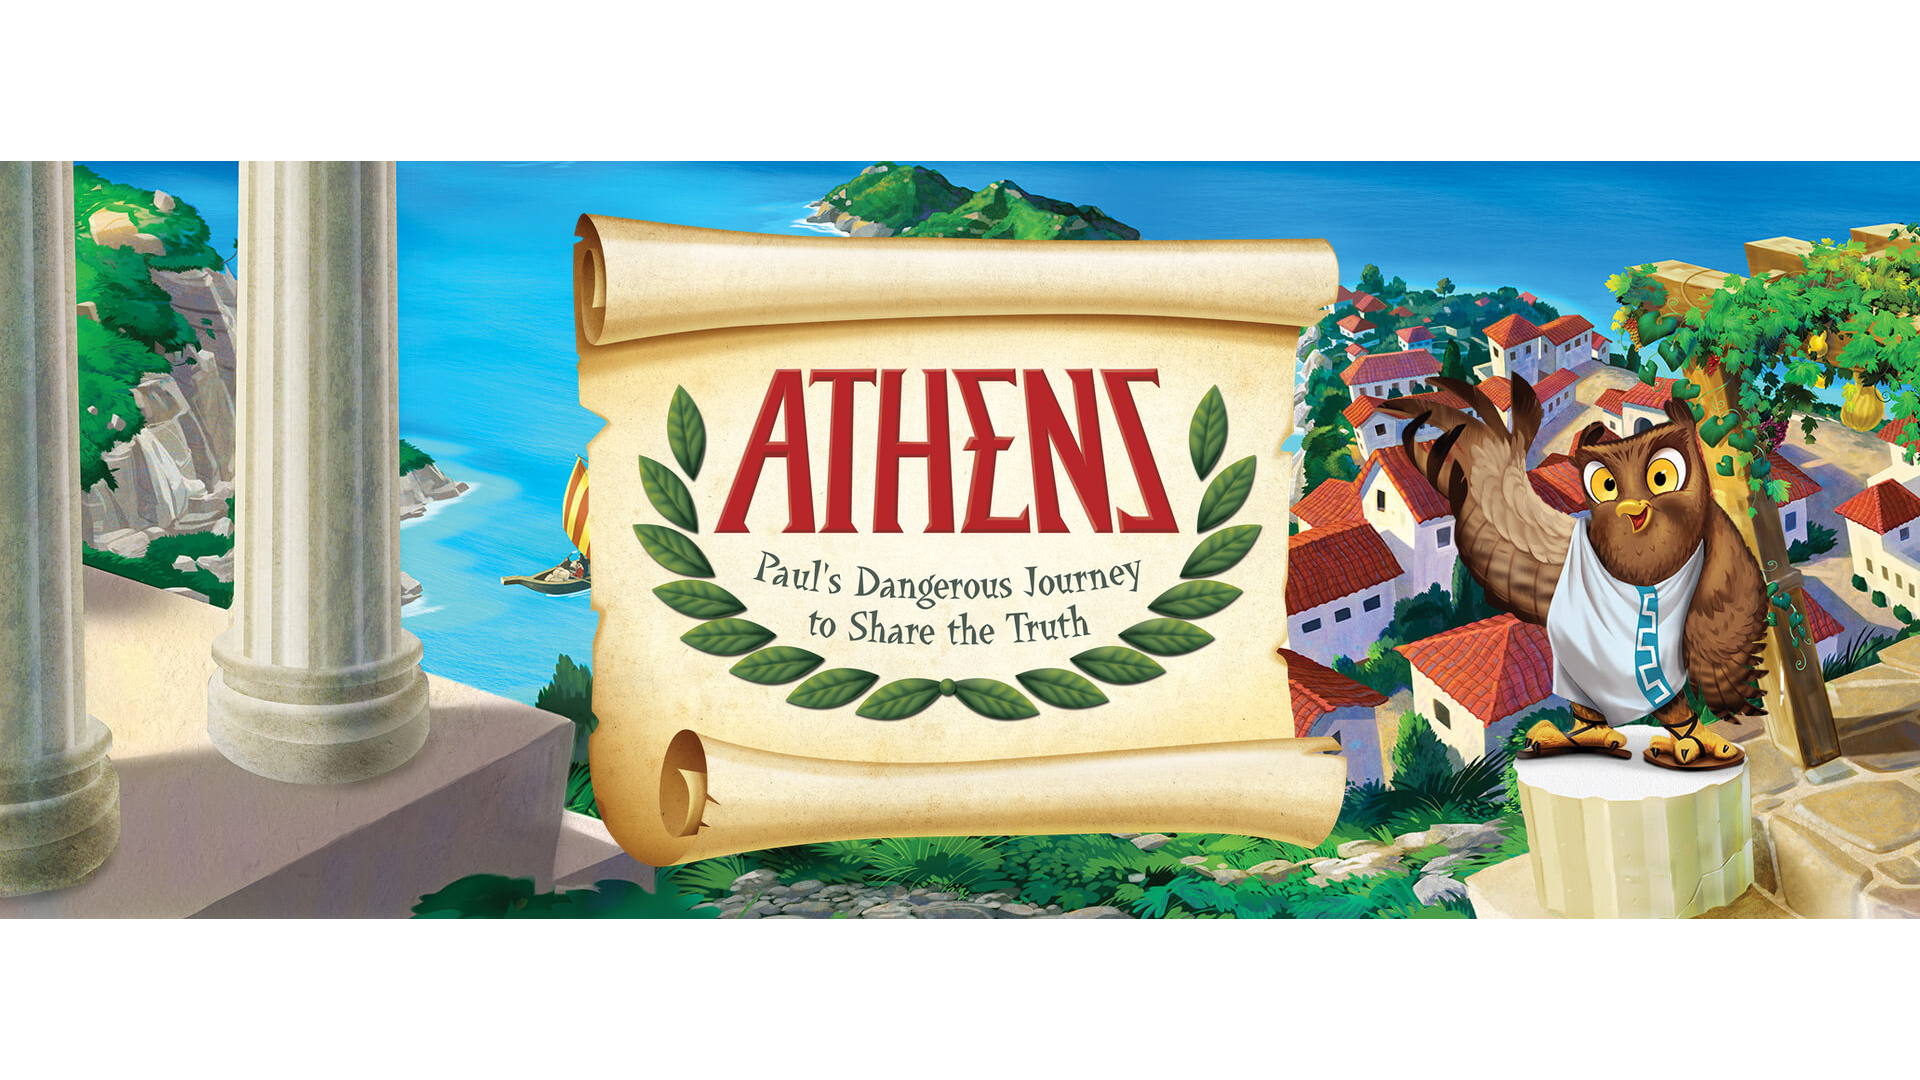 athens-header-bg2.jpg